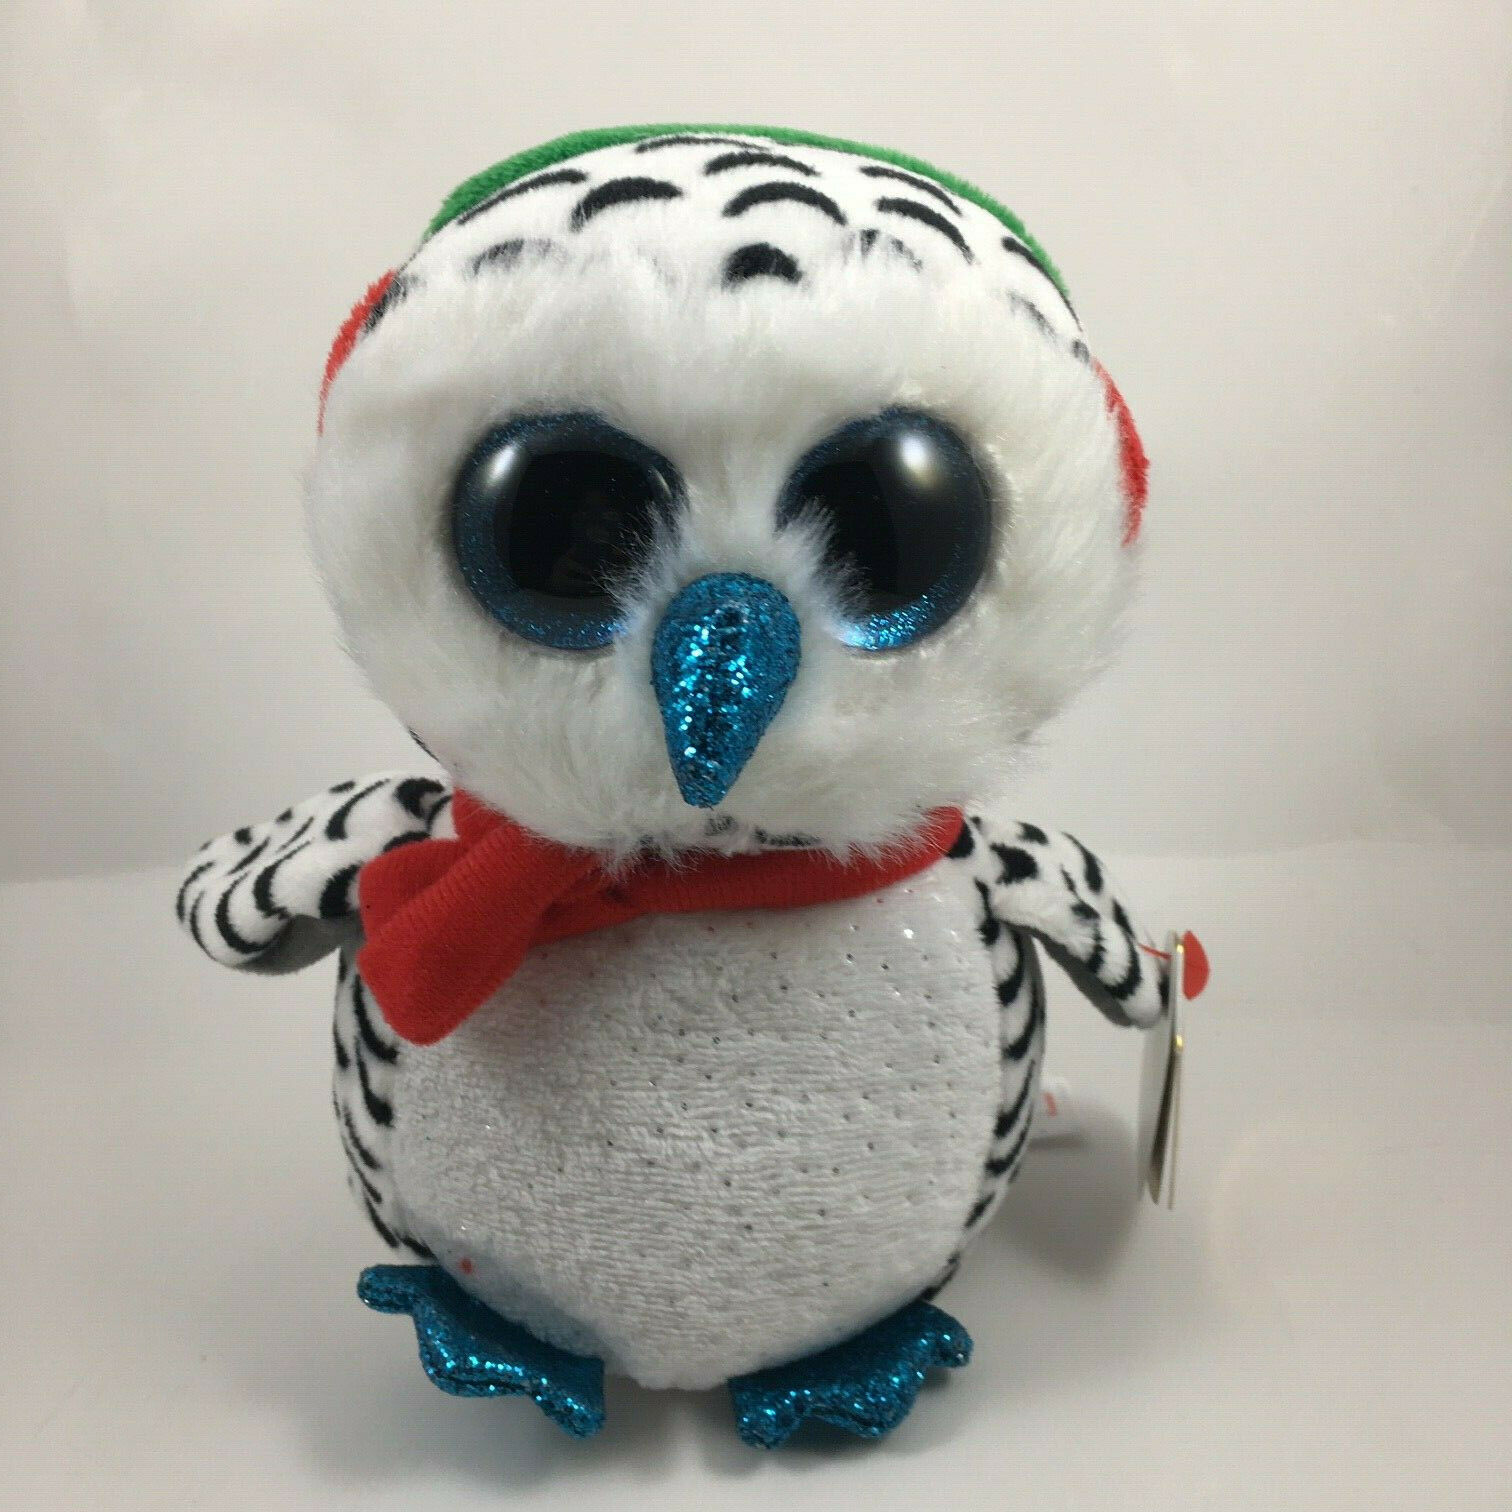 "TY Christmas Beanie Boos 6"" NESTER the Owl Plush Stuffed Ani"